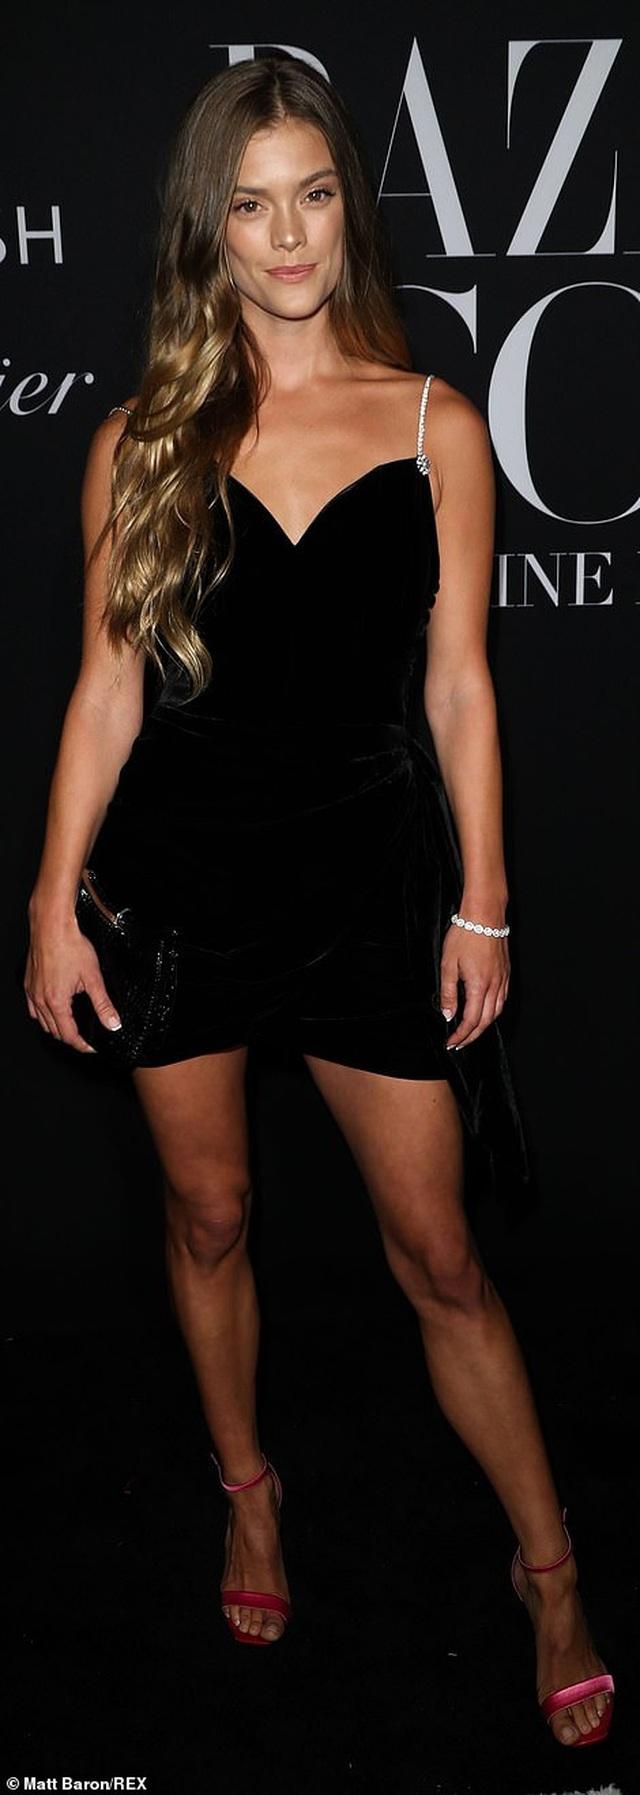 Siêu mẫu bạch biến Winnie Harlow nổi bật tại tuần lễ thời trang New York - 20